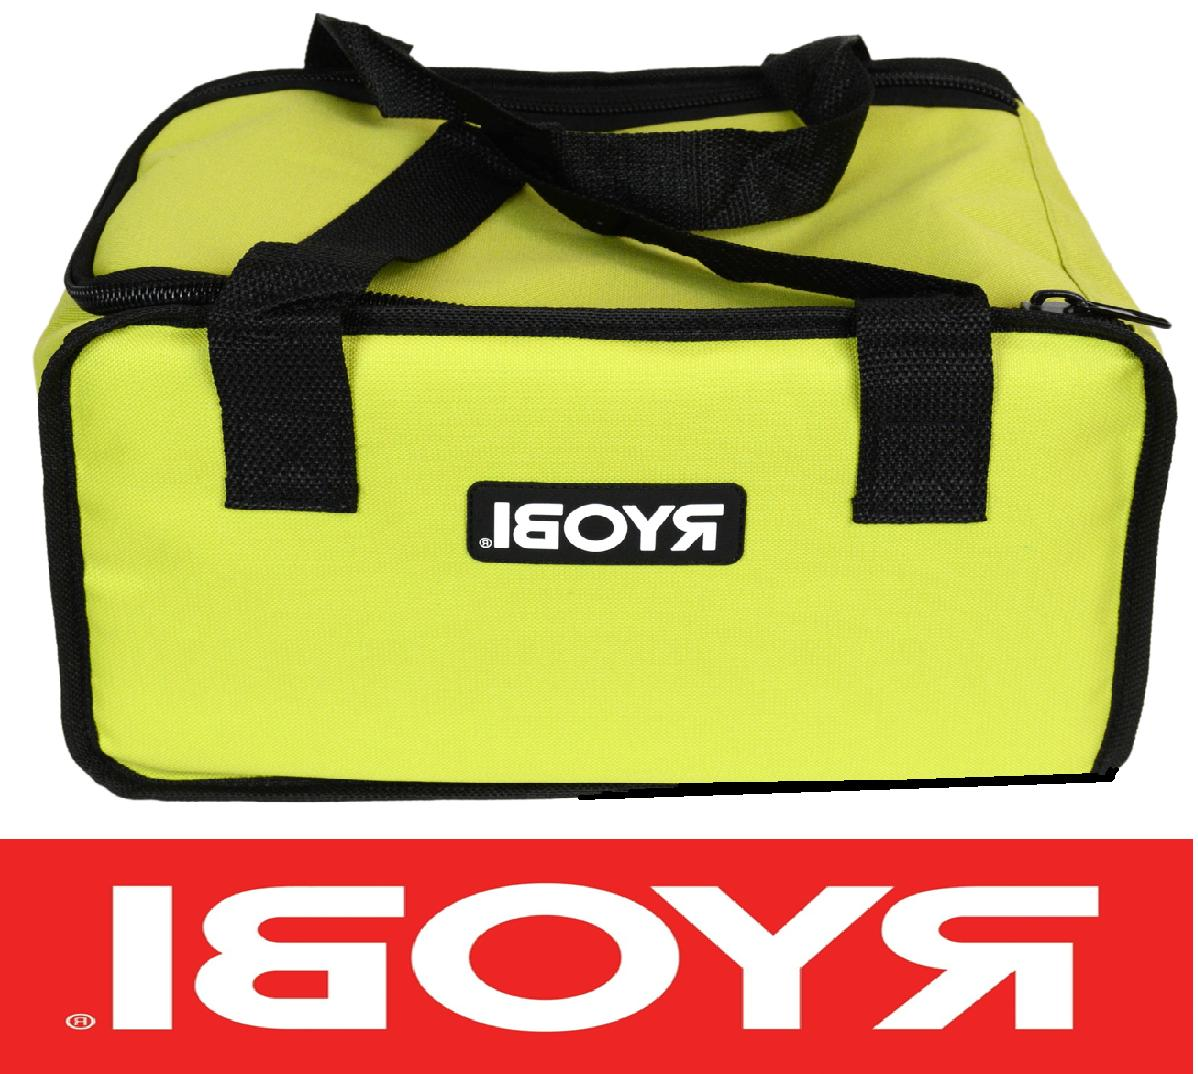 NEW RYOBI TOOL BAG / CASE FOR CORDLESS DRILL & JIGSAW KIT  B